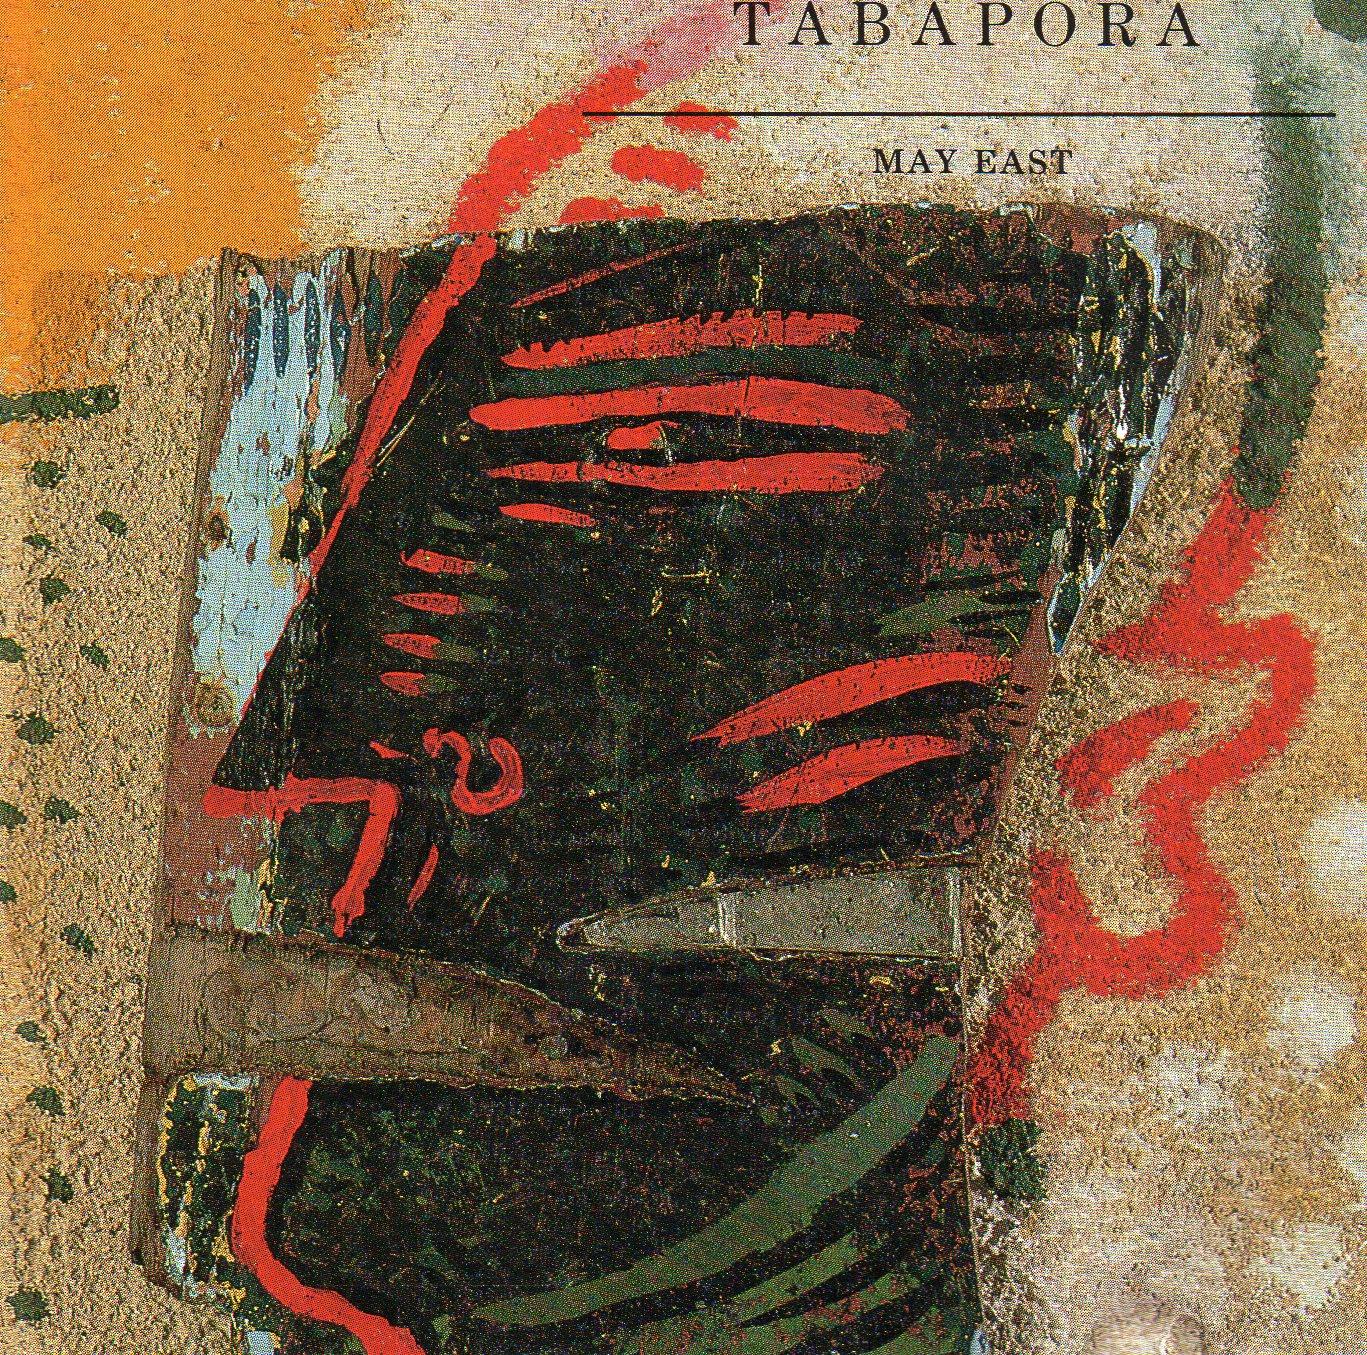 Tabapora